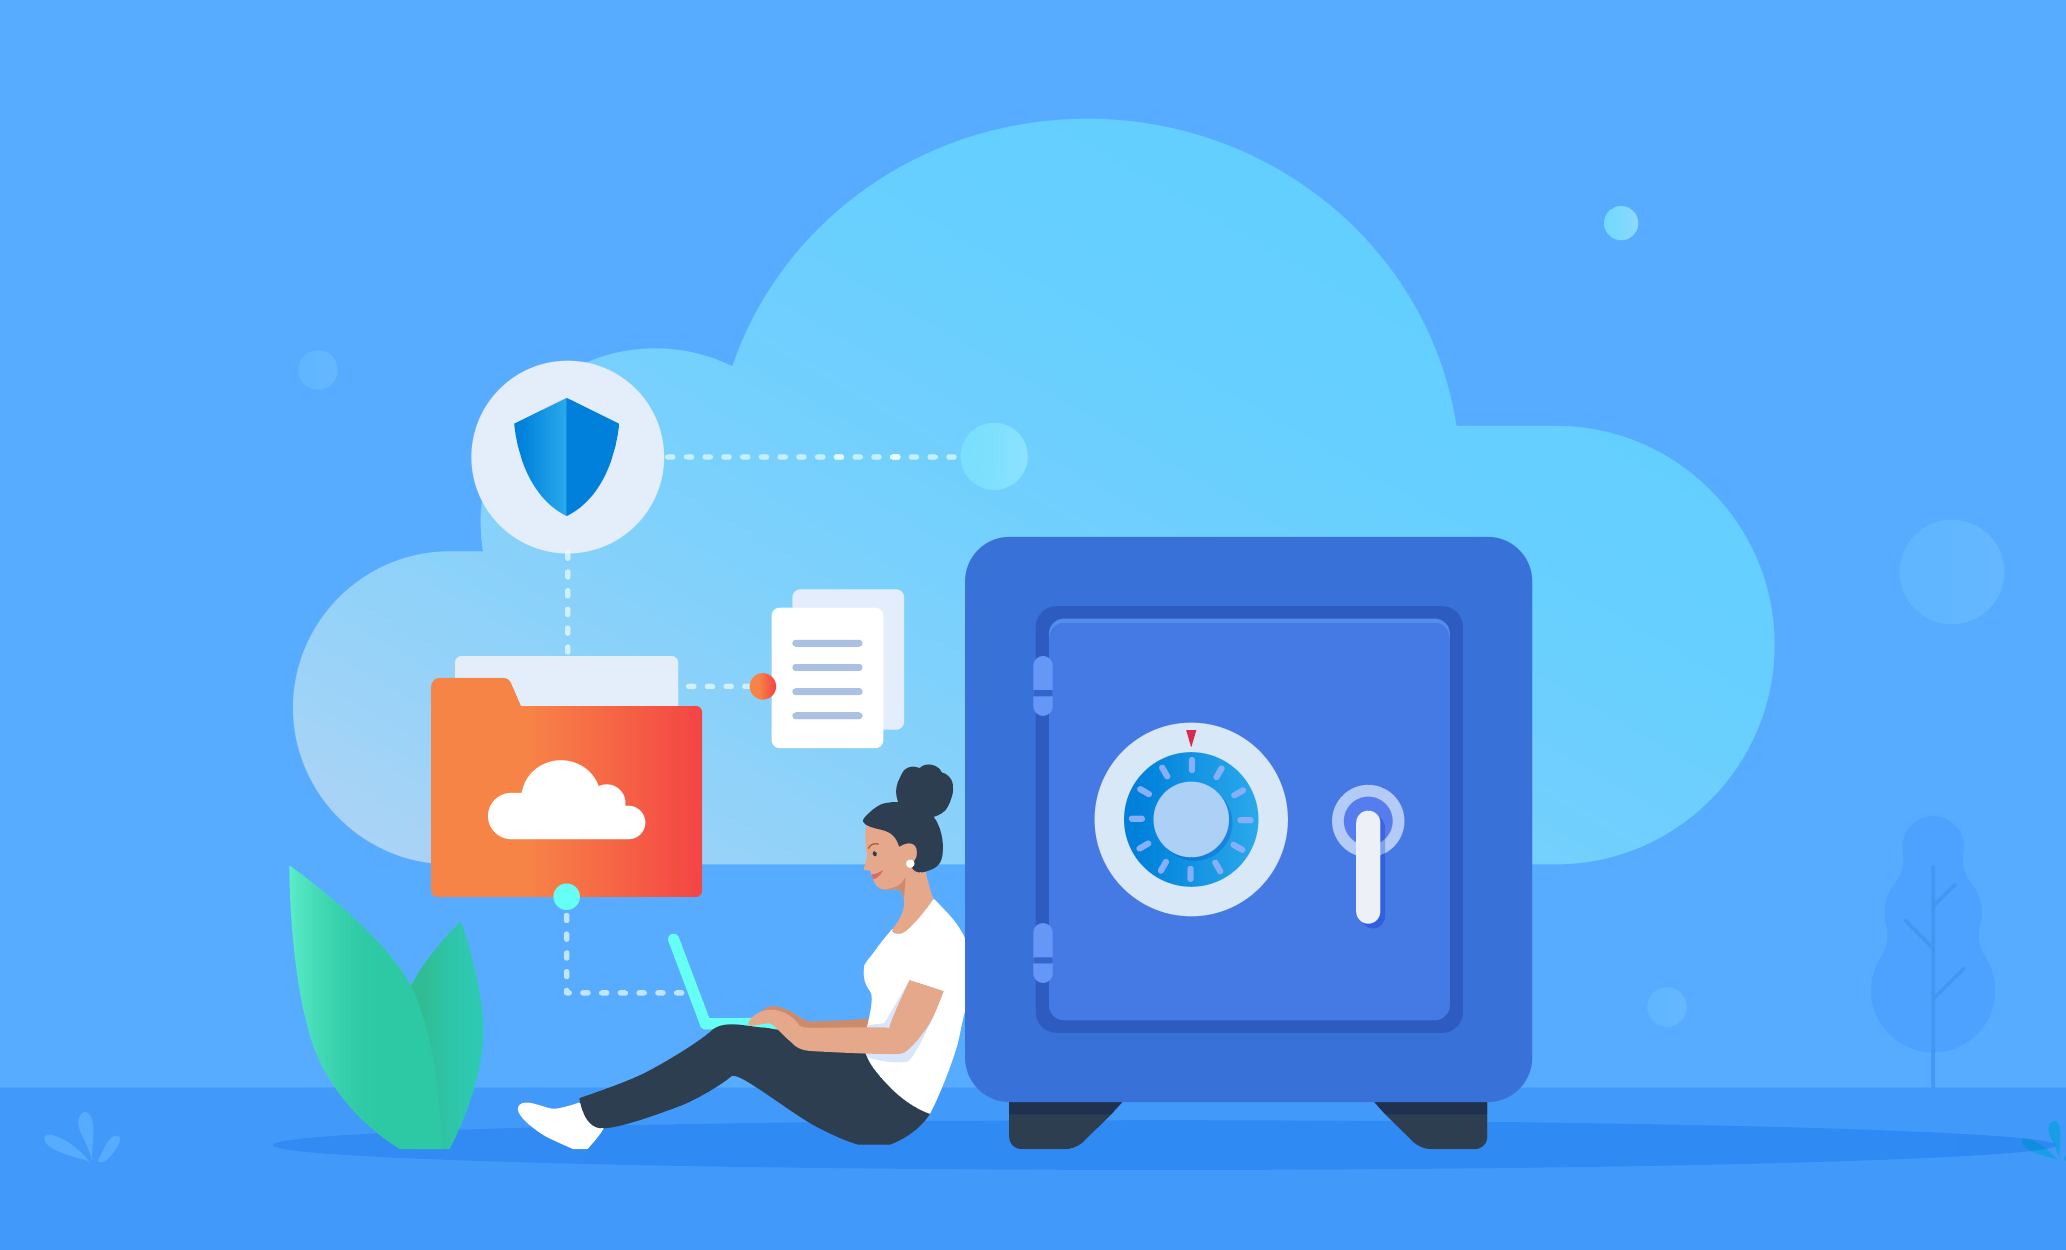 Increase Google Cloud Storage